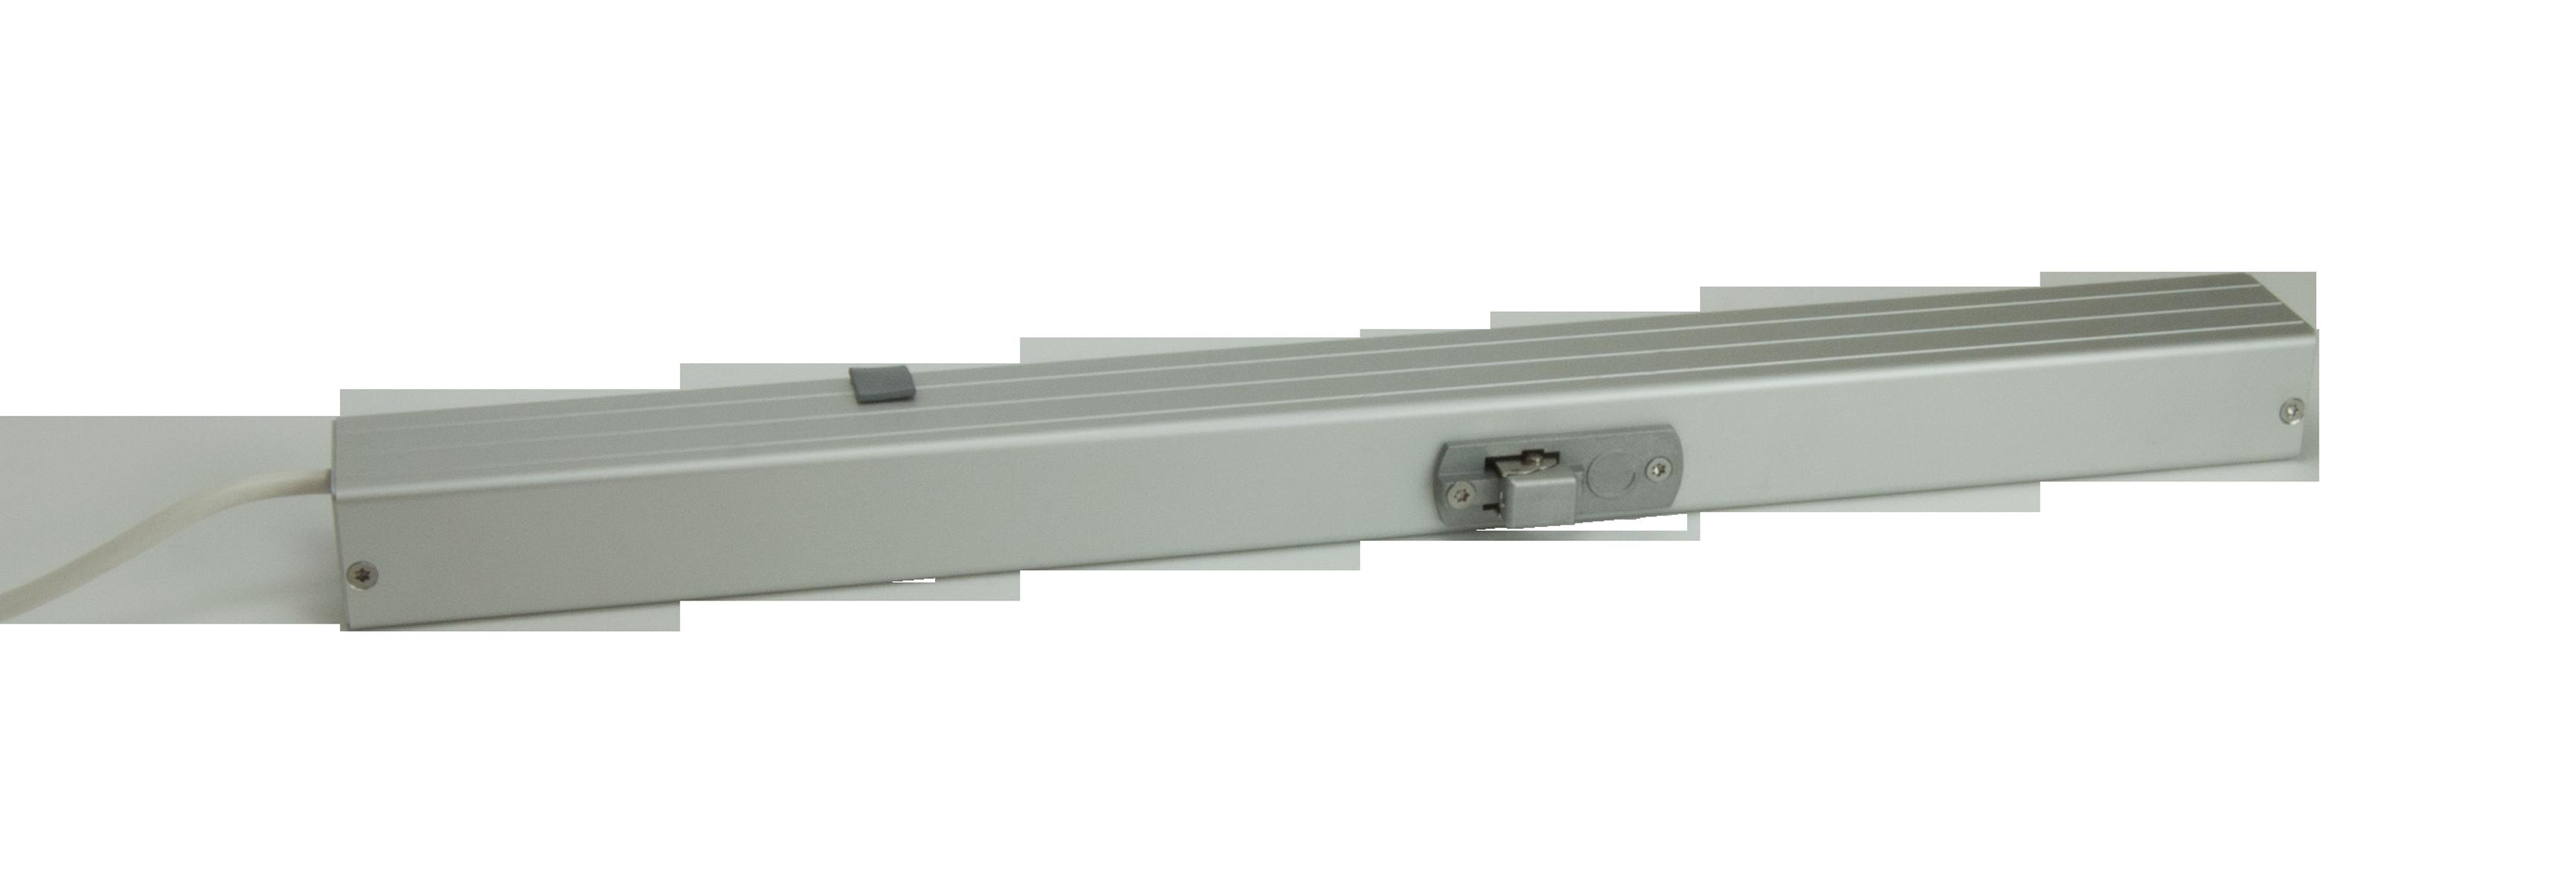 Chain actuator EA230-K50